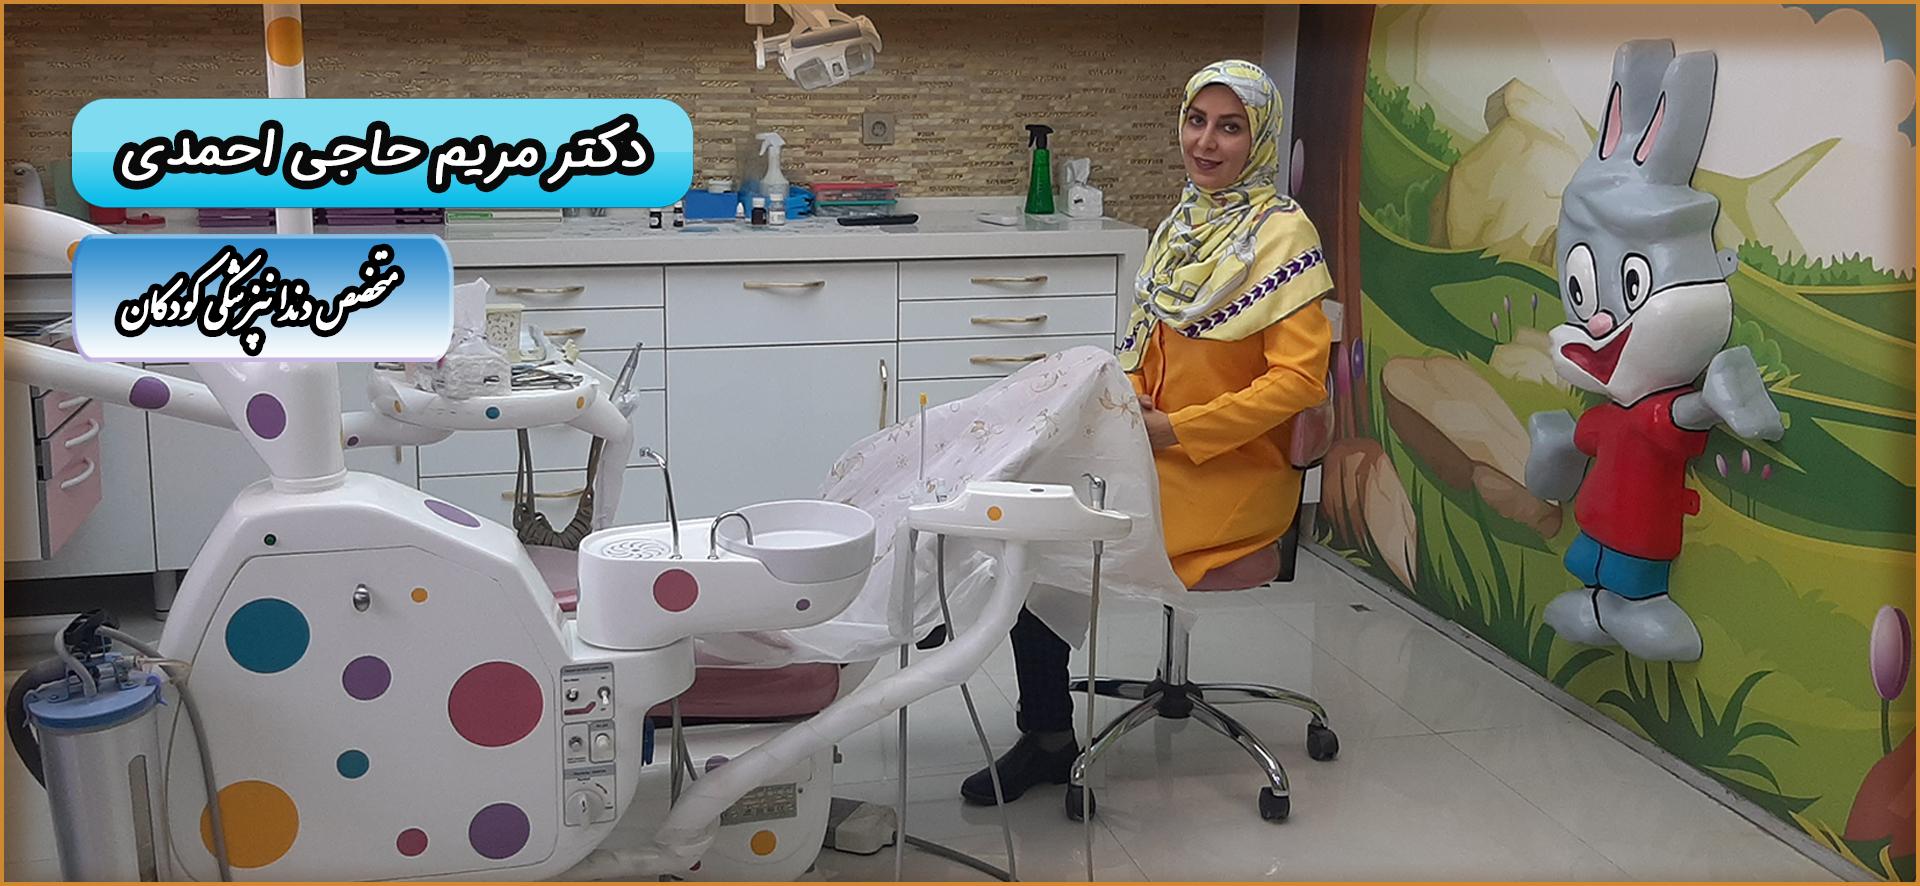 دکتر مریم حاجی احمدی | متخصص دندانپزشکی کودکان